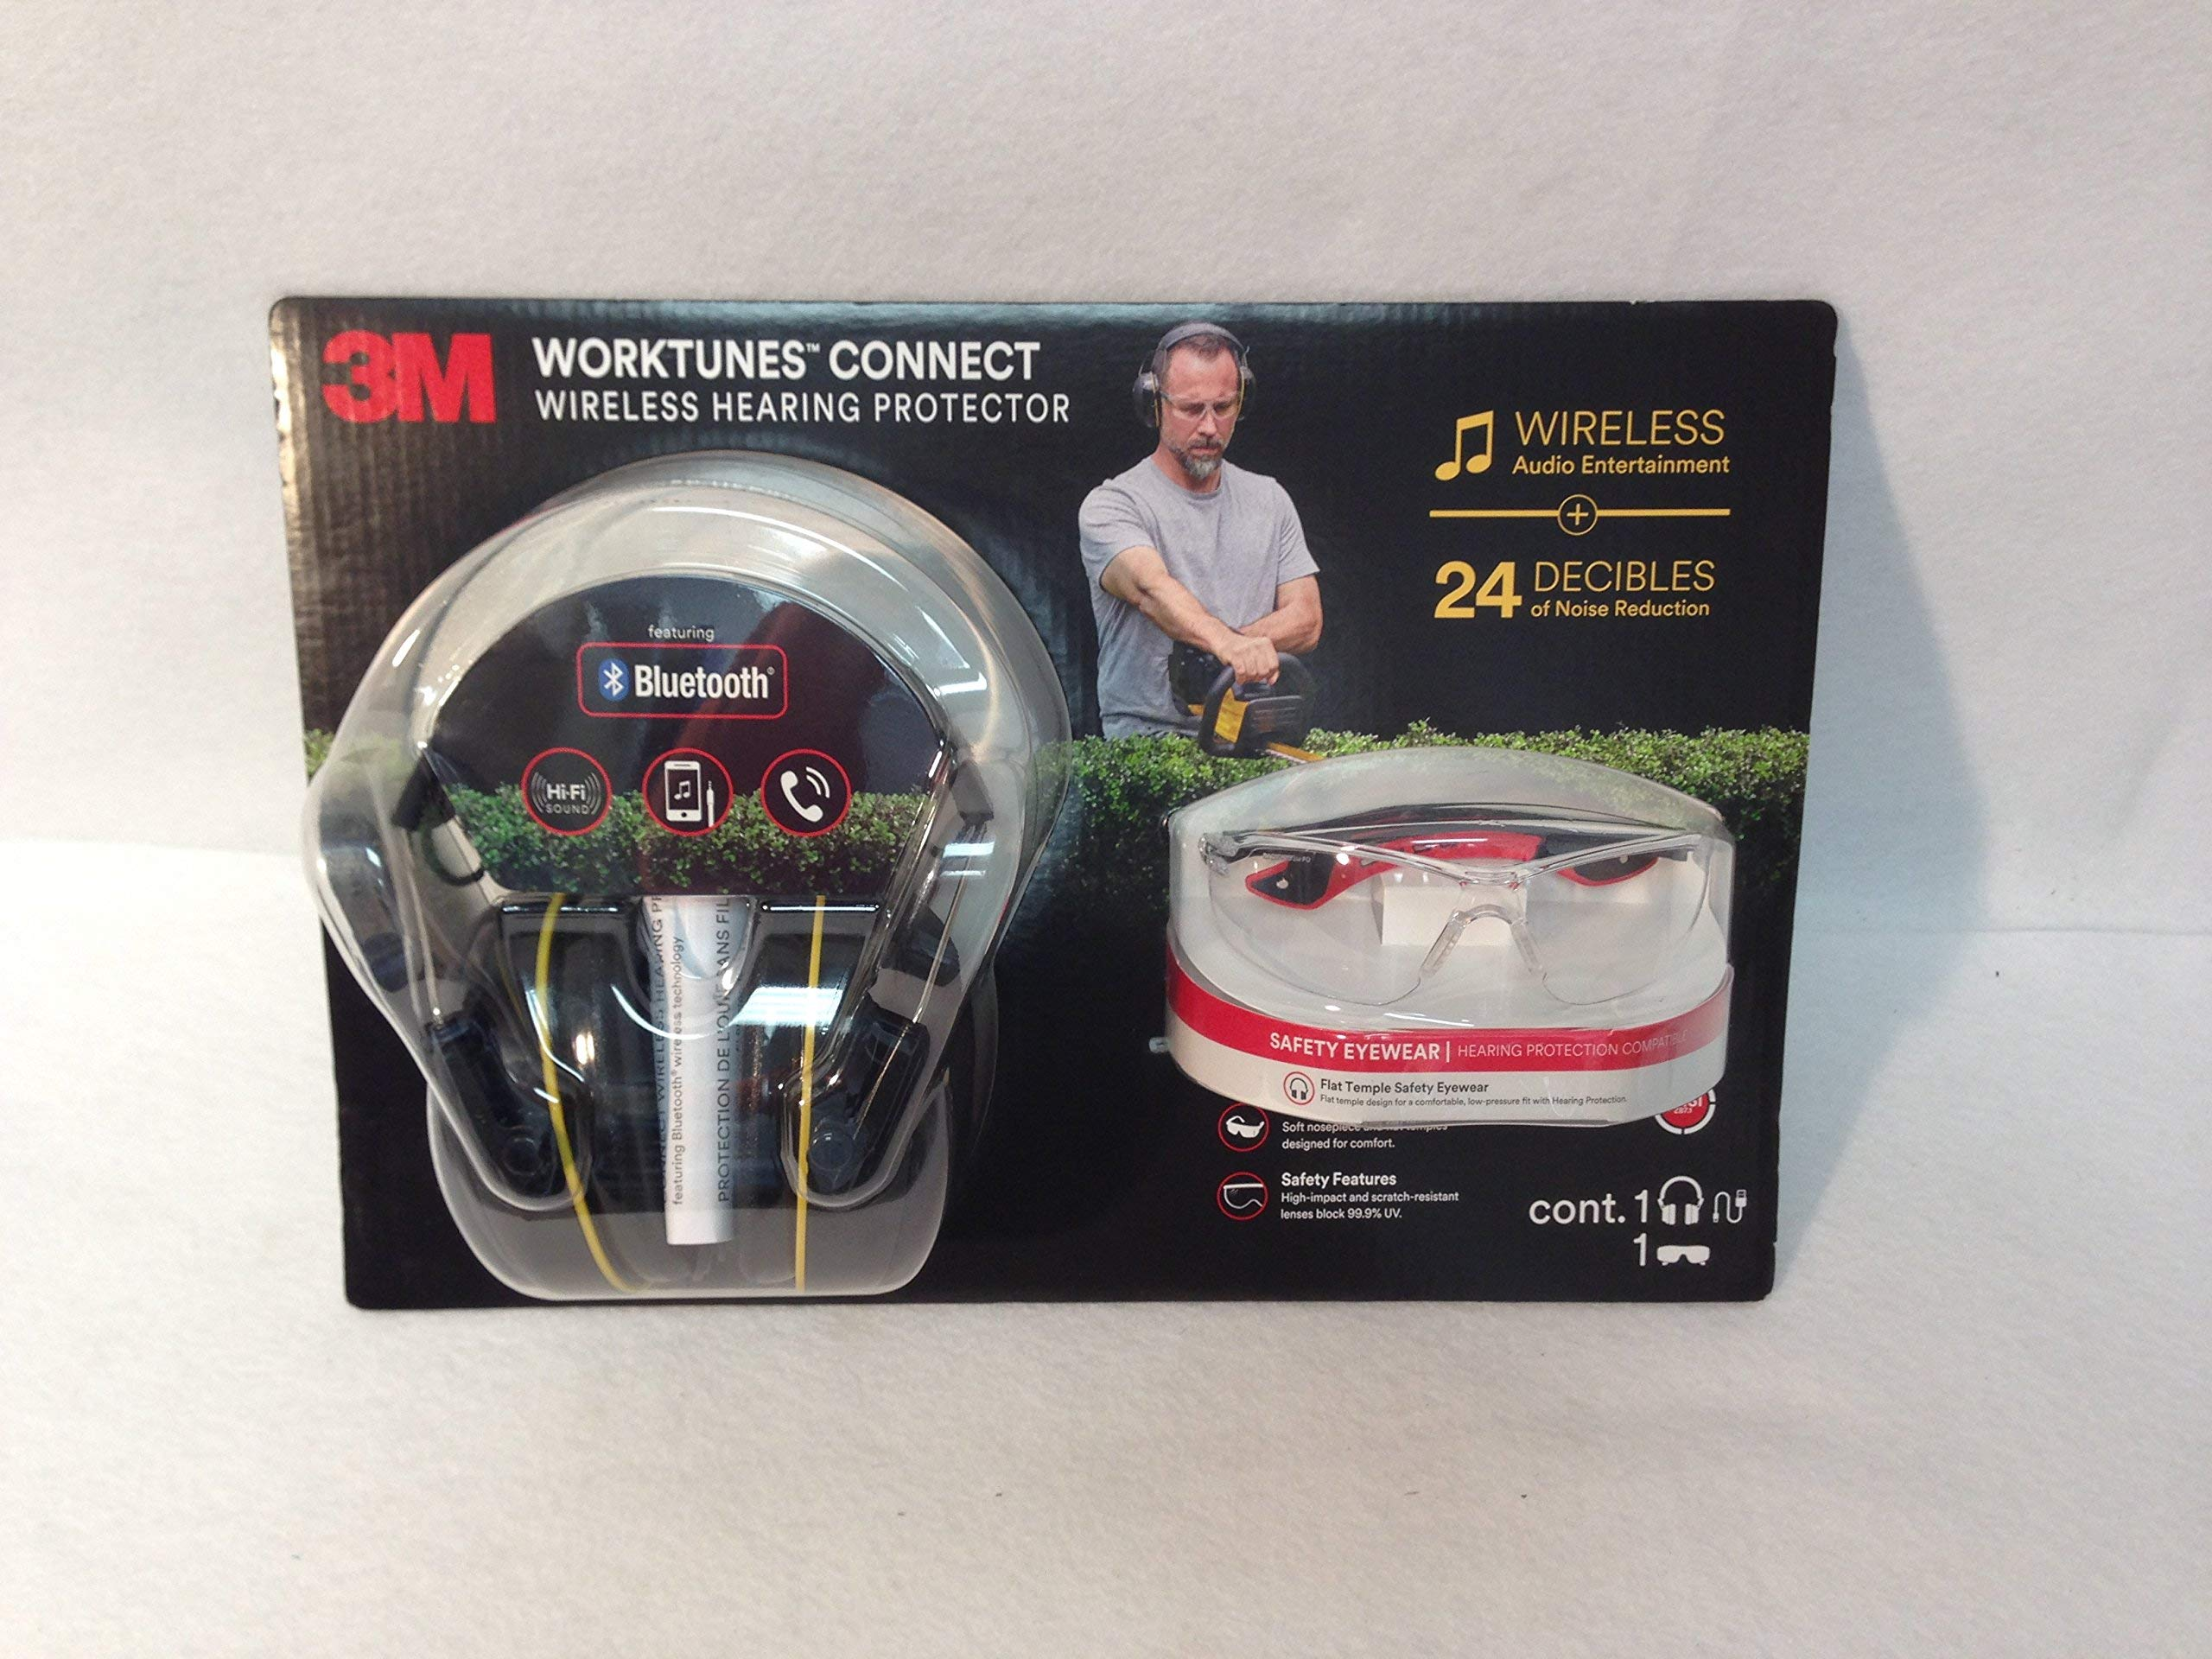 3M worktunes Connect Wireless hearing protector + Safety Eyewear by Worktunes